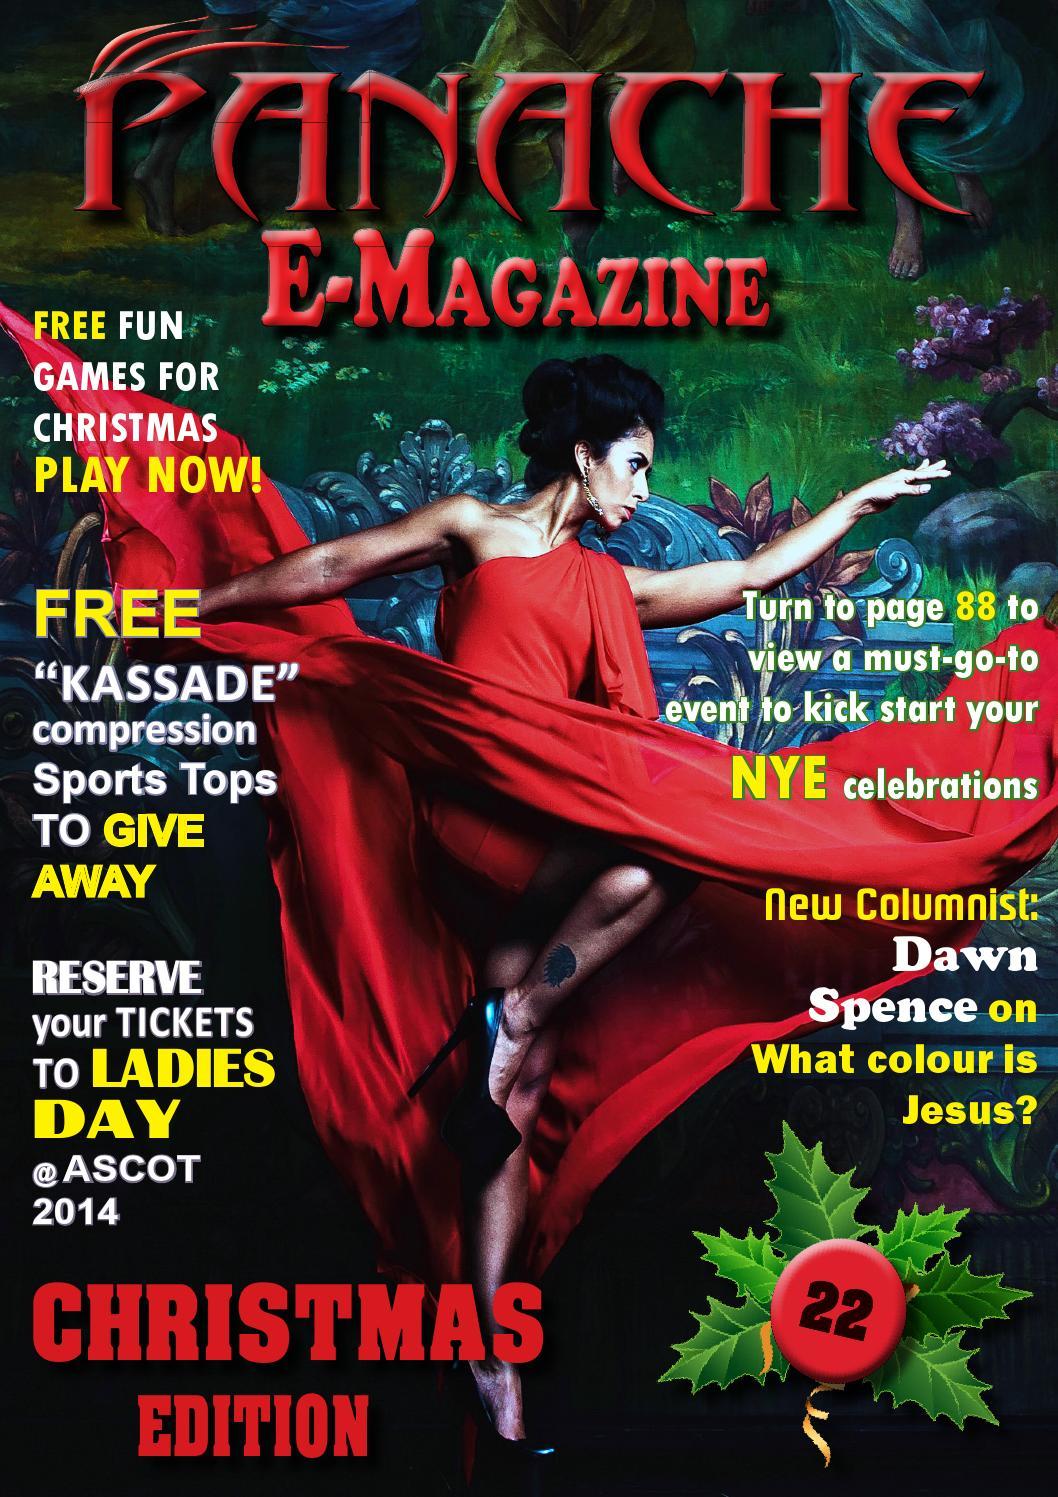 Panache E Magazine Issue 22 By Panache Occasions Limited